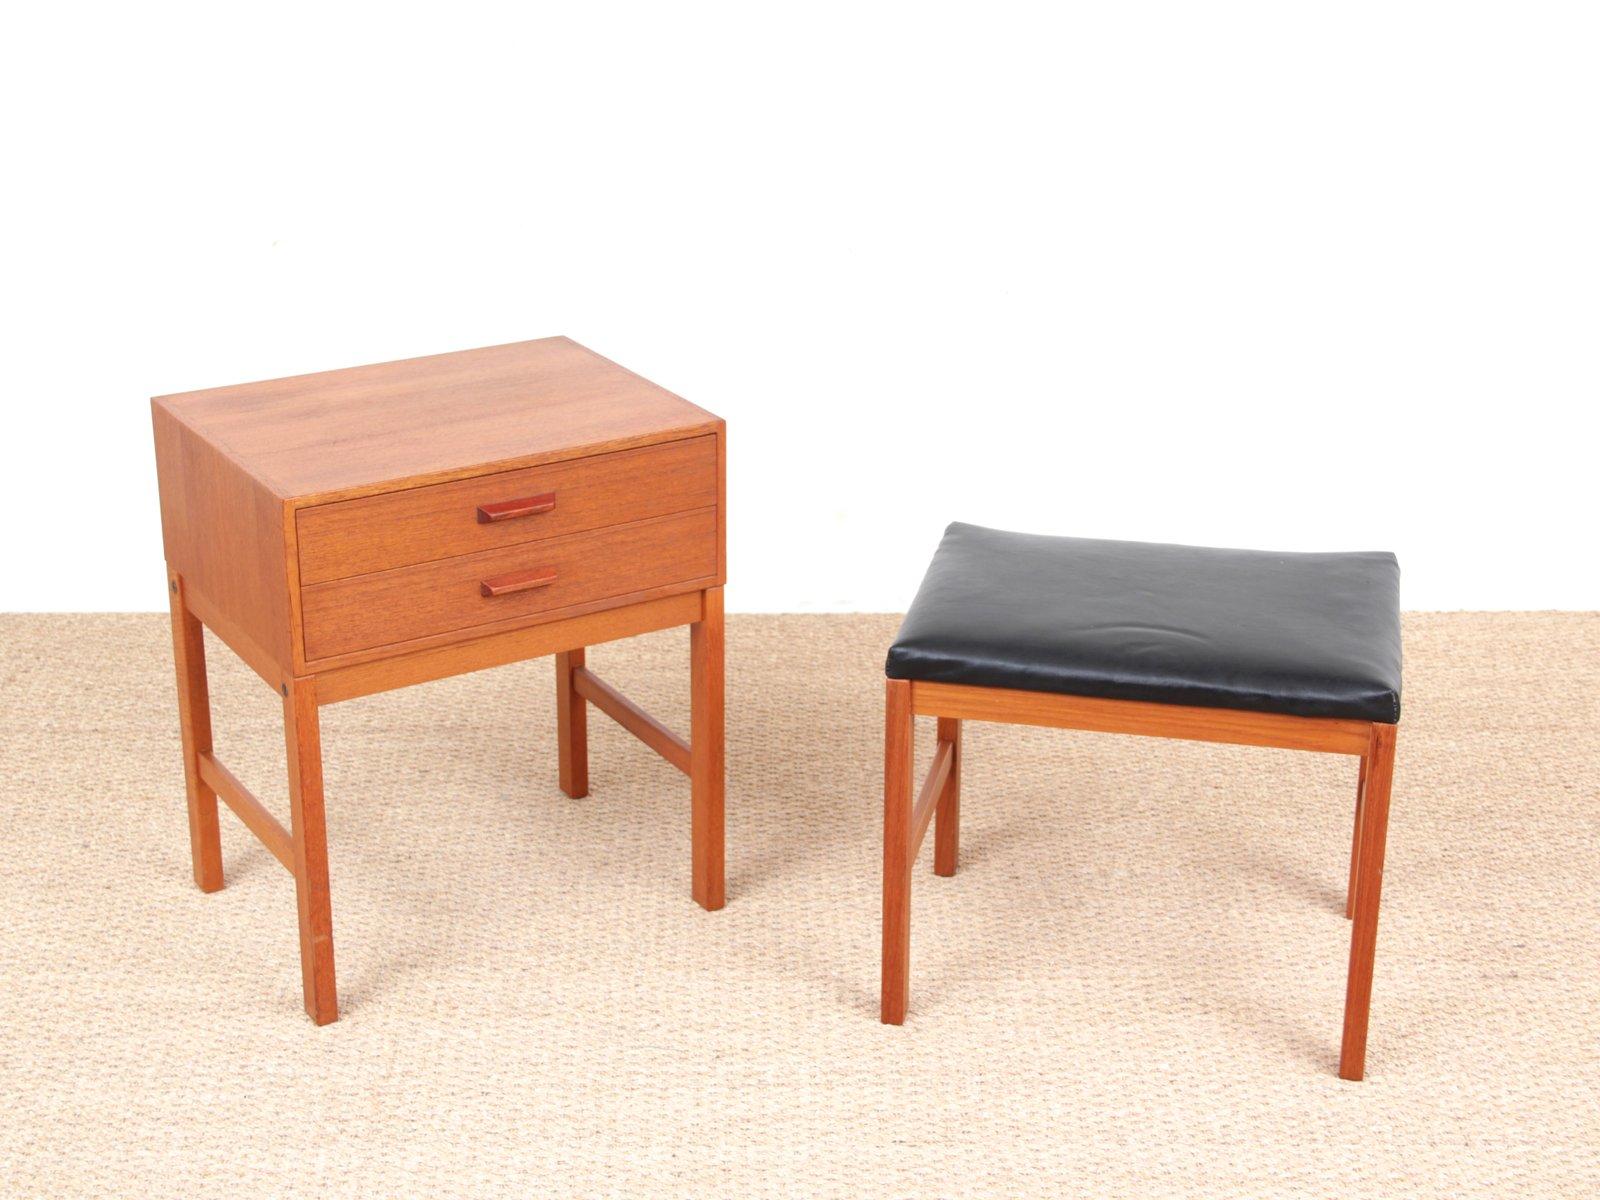 Mid Century Modern Scandinavian Hall Furniture In Teak, 1960s, Set Of 2